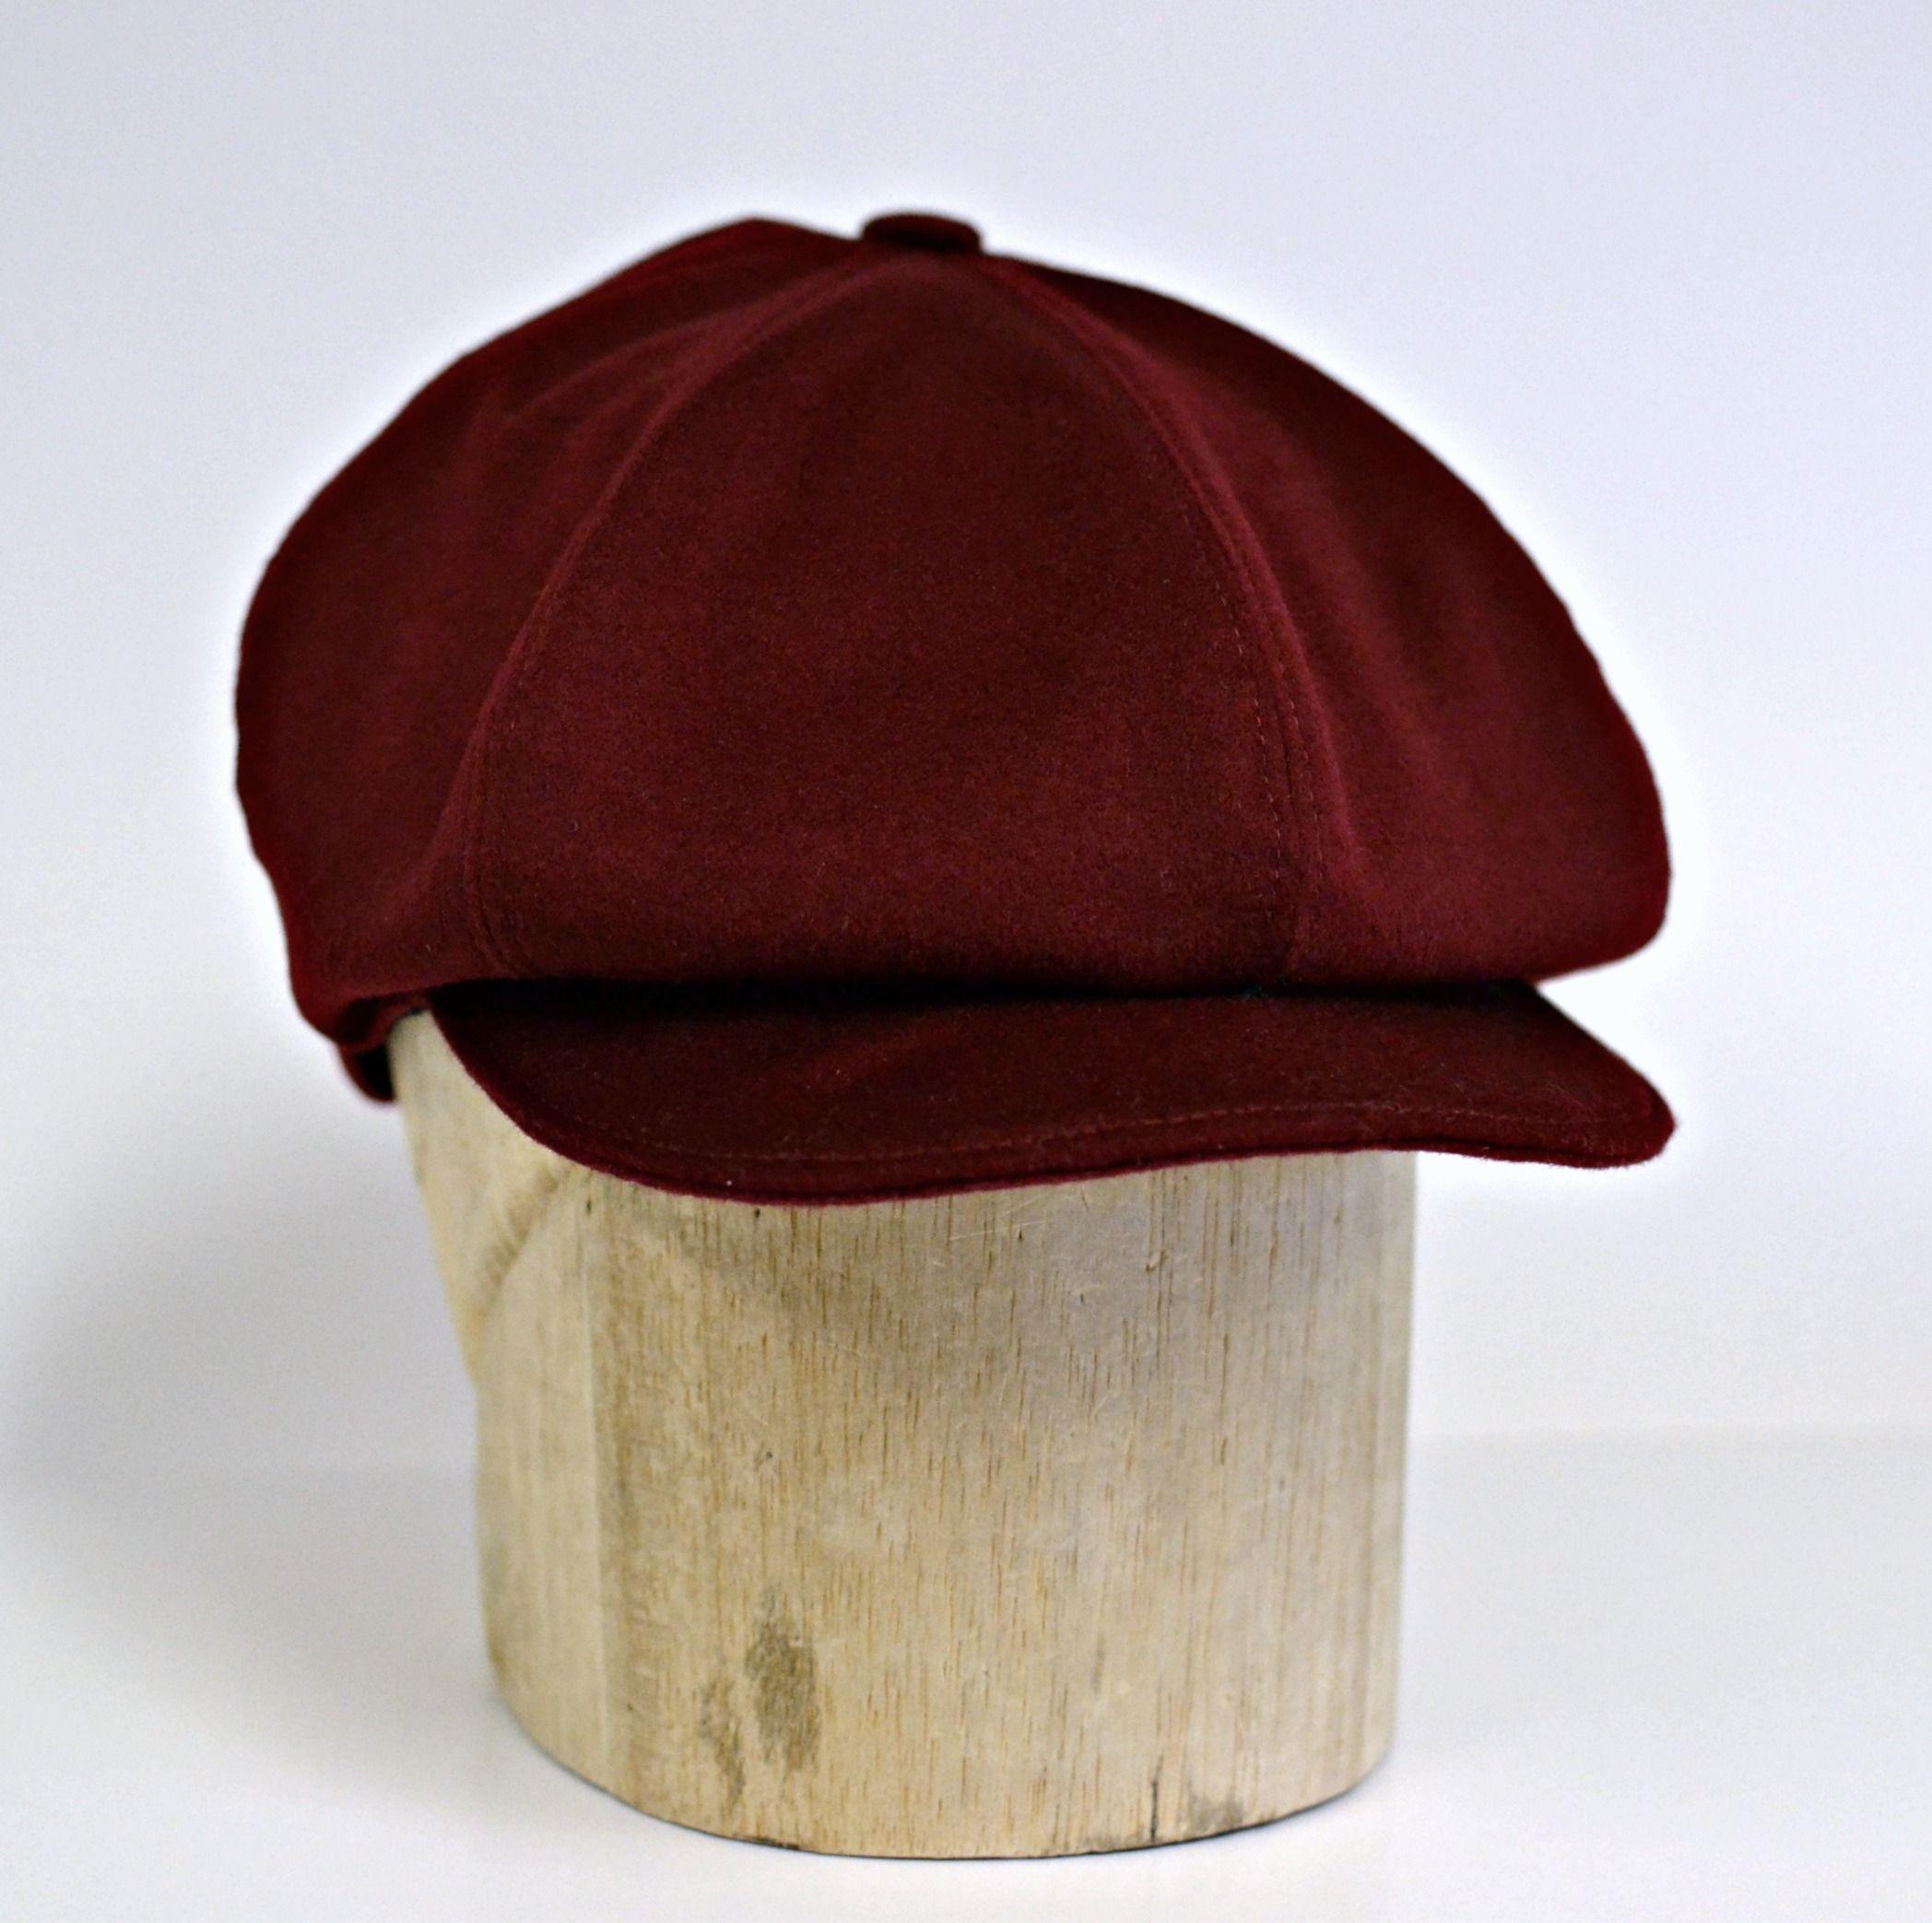 bd9ecafd4 Men's Newsboy Hat in Vintage Wool - Newsboy Cap - Men's Hat - Dark ...